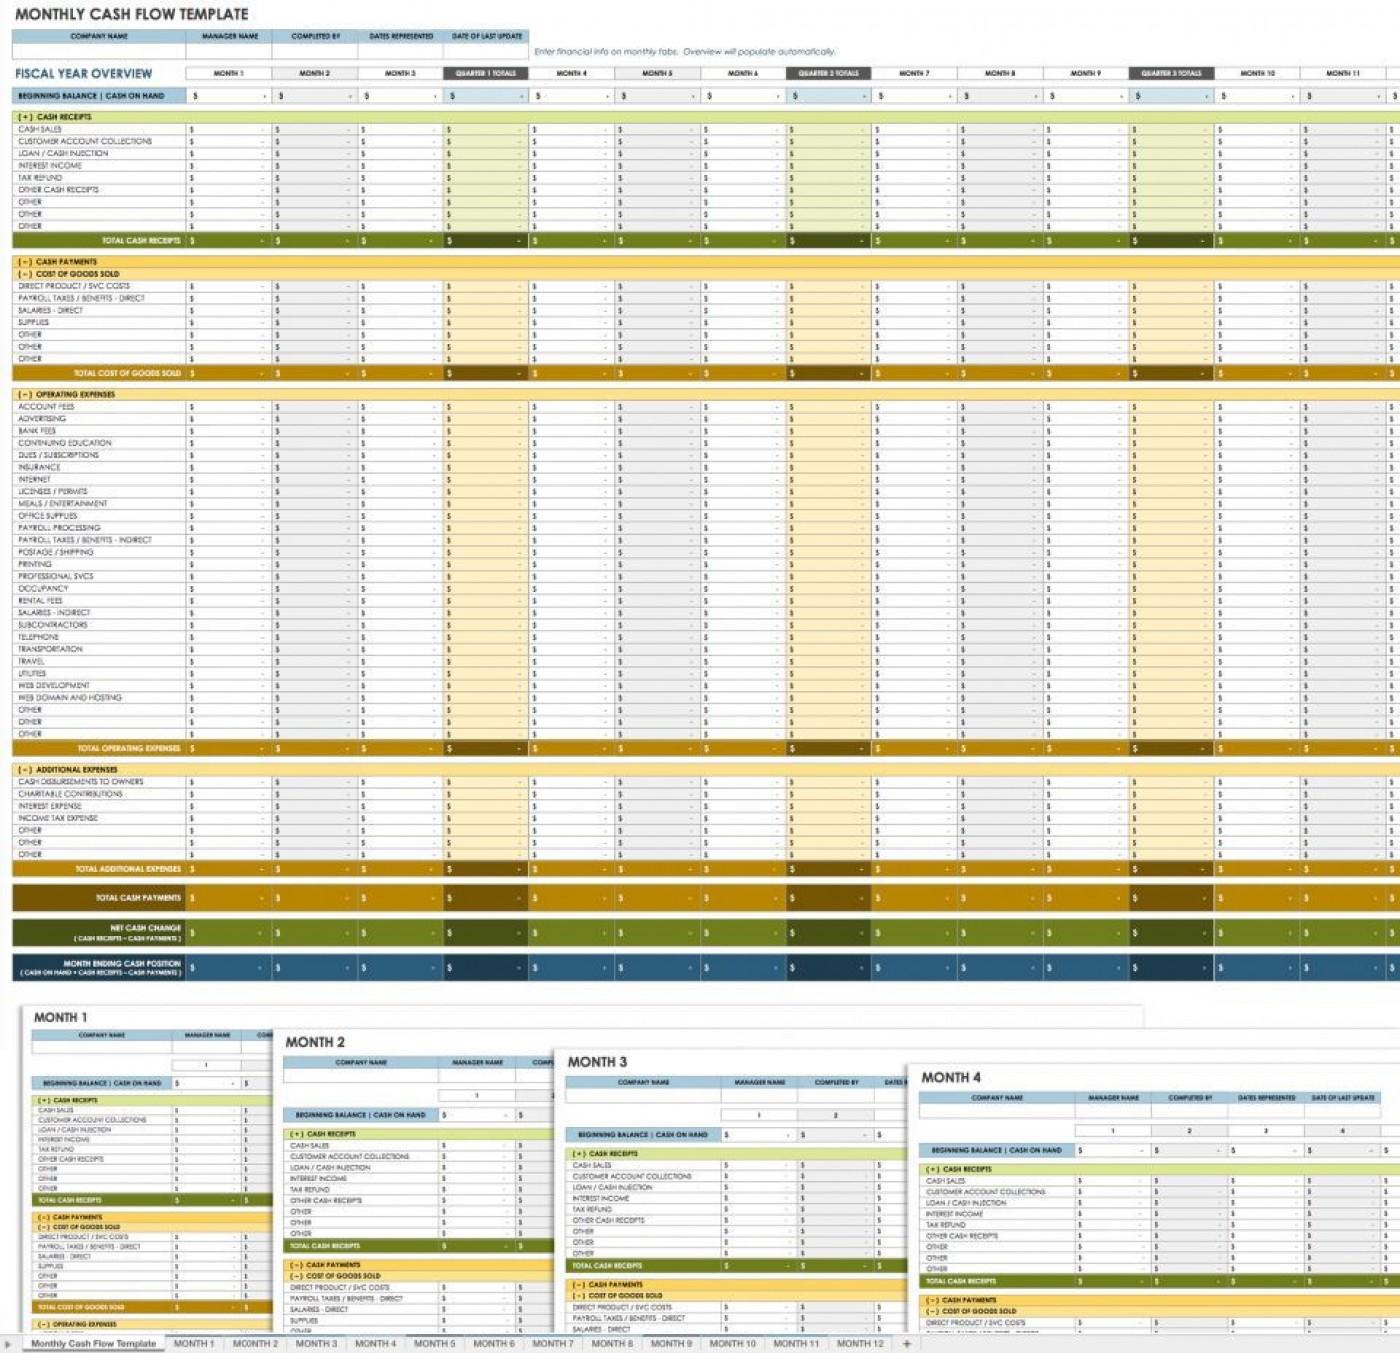 006 Remarkable Cash Flow Sample Excel Image  Spreadsheet Free Forecast Template1400